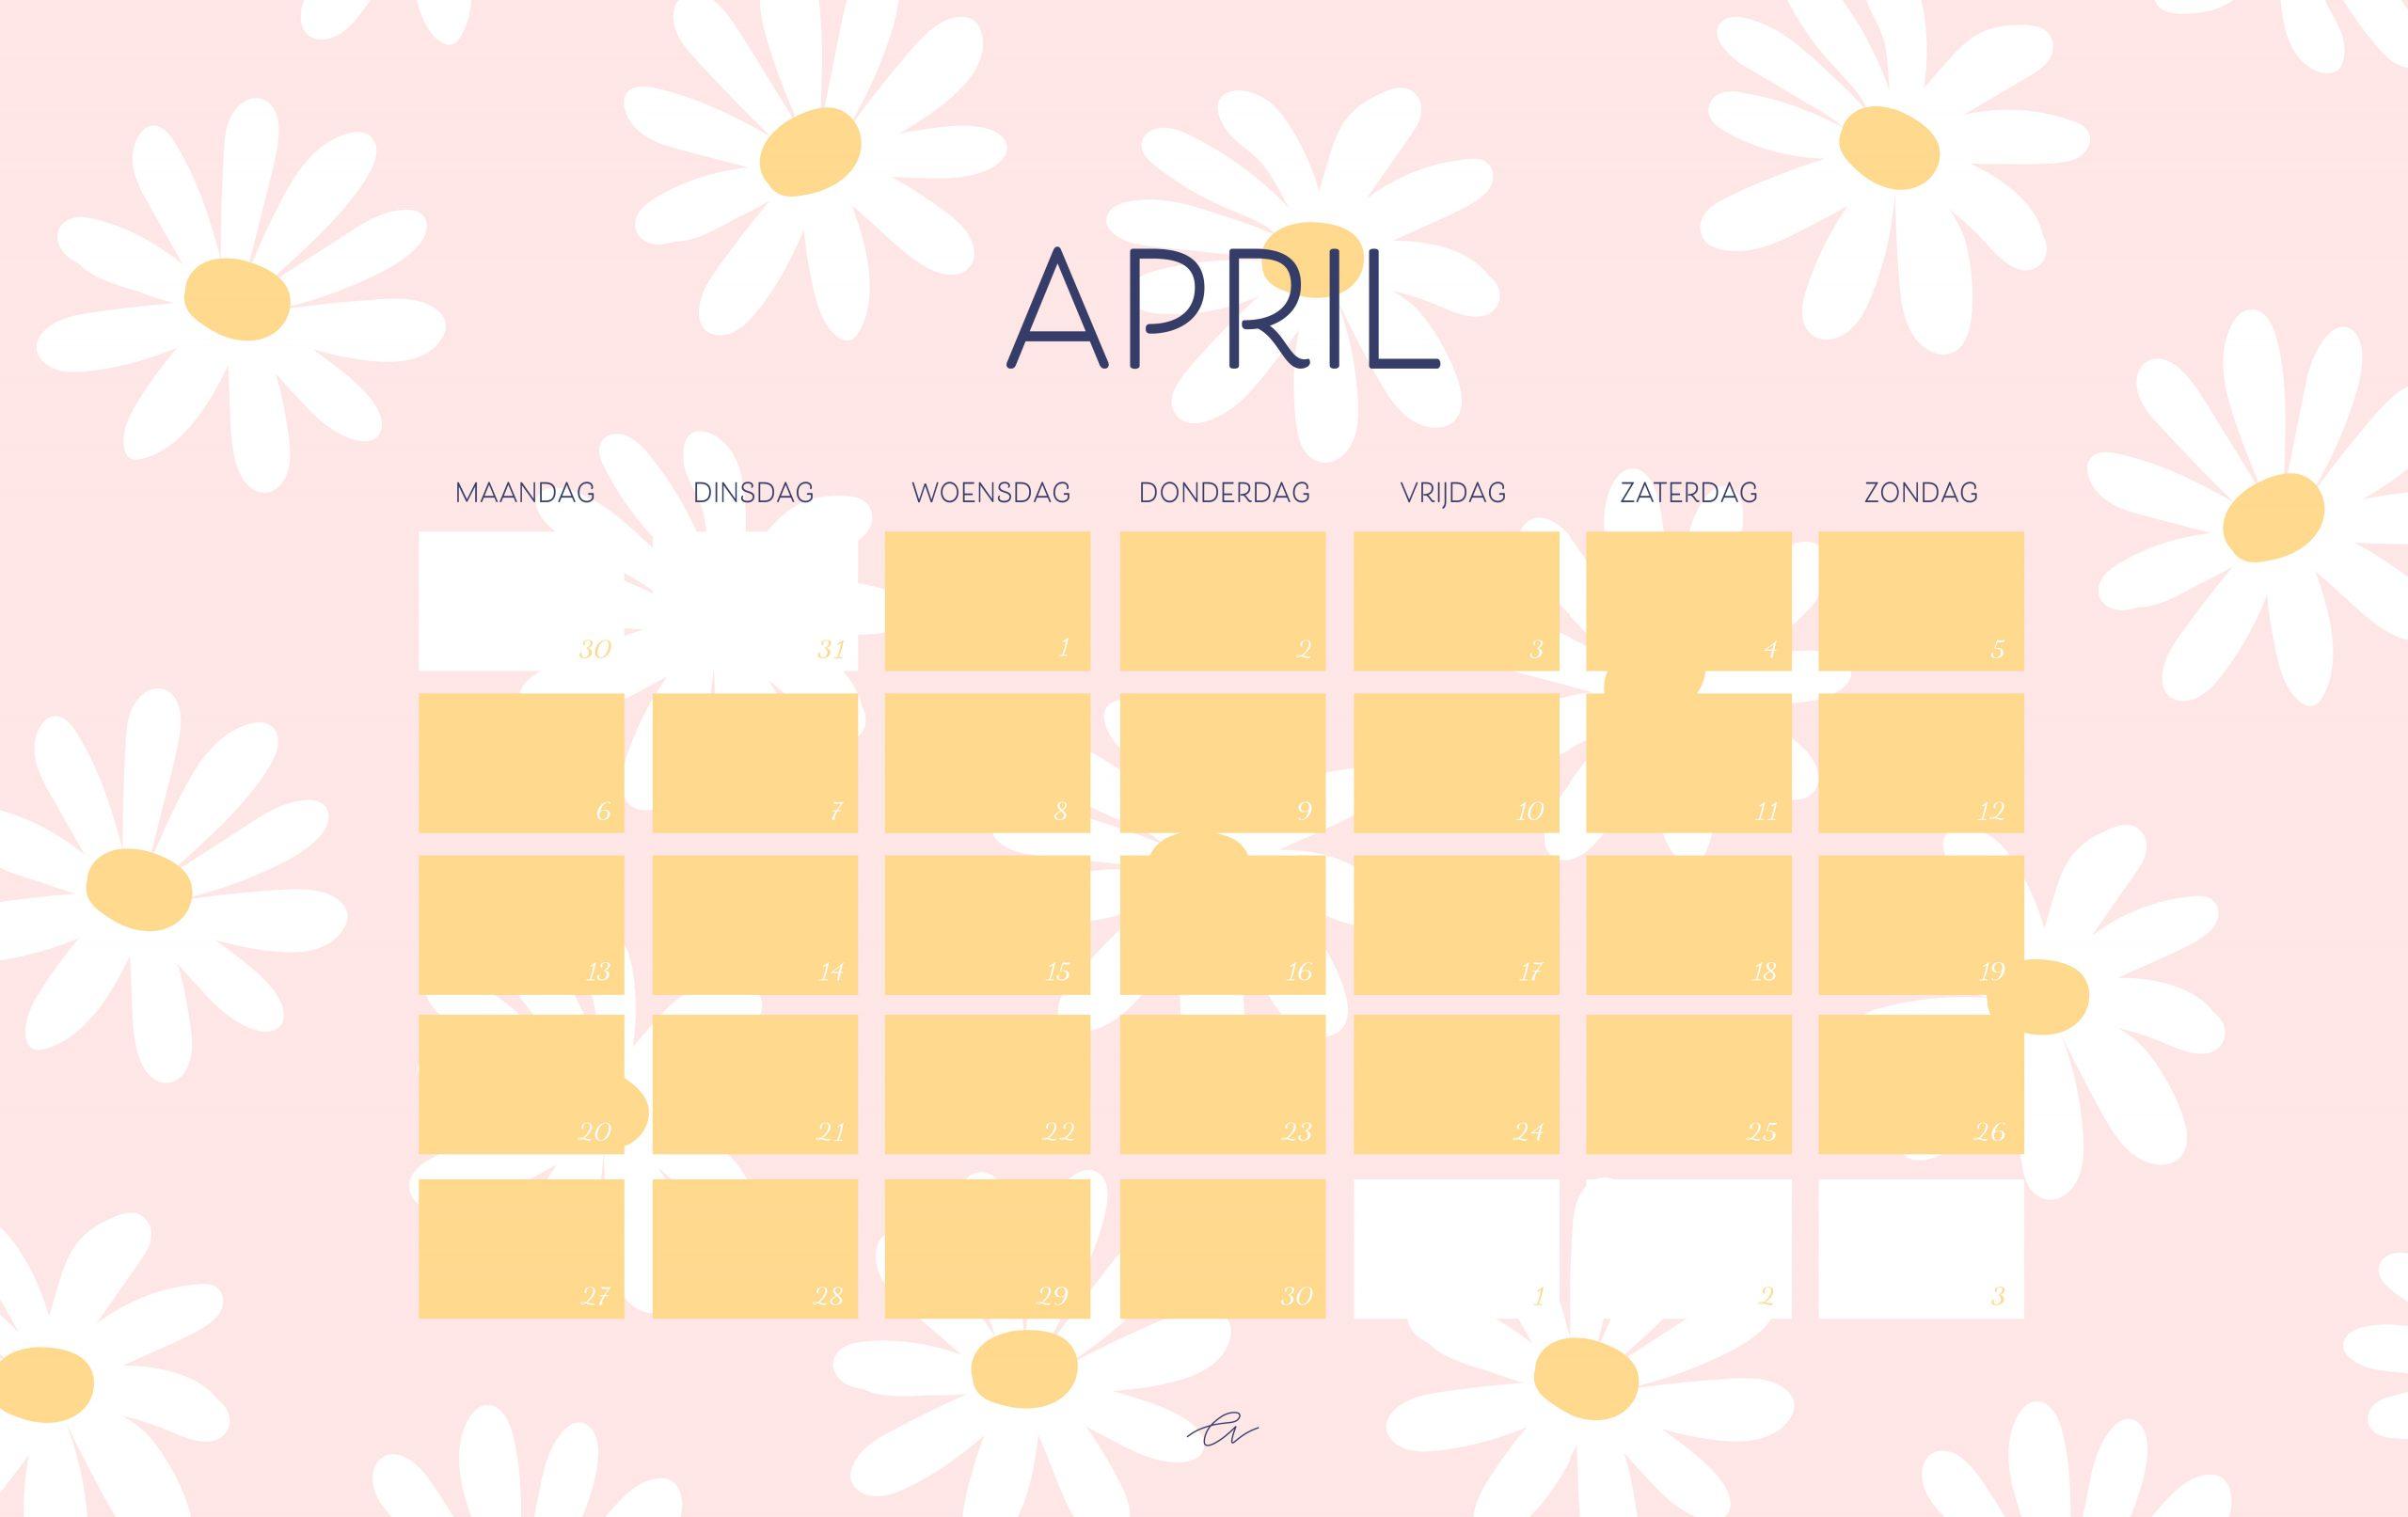 Wallpaper kalender april 2020